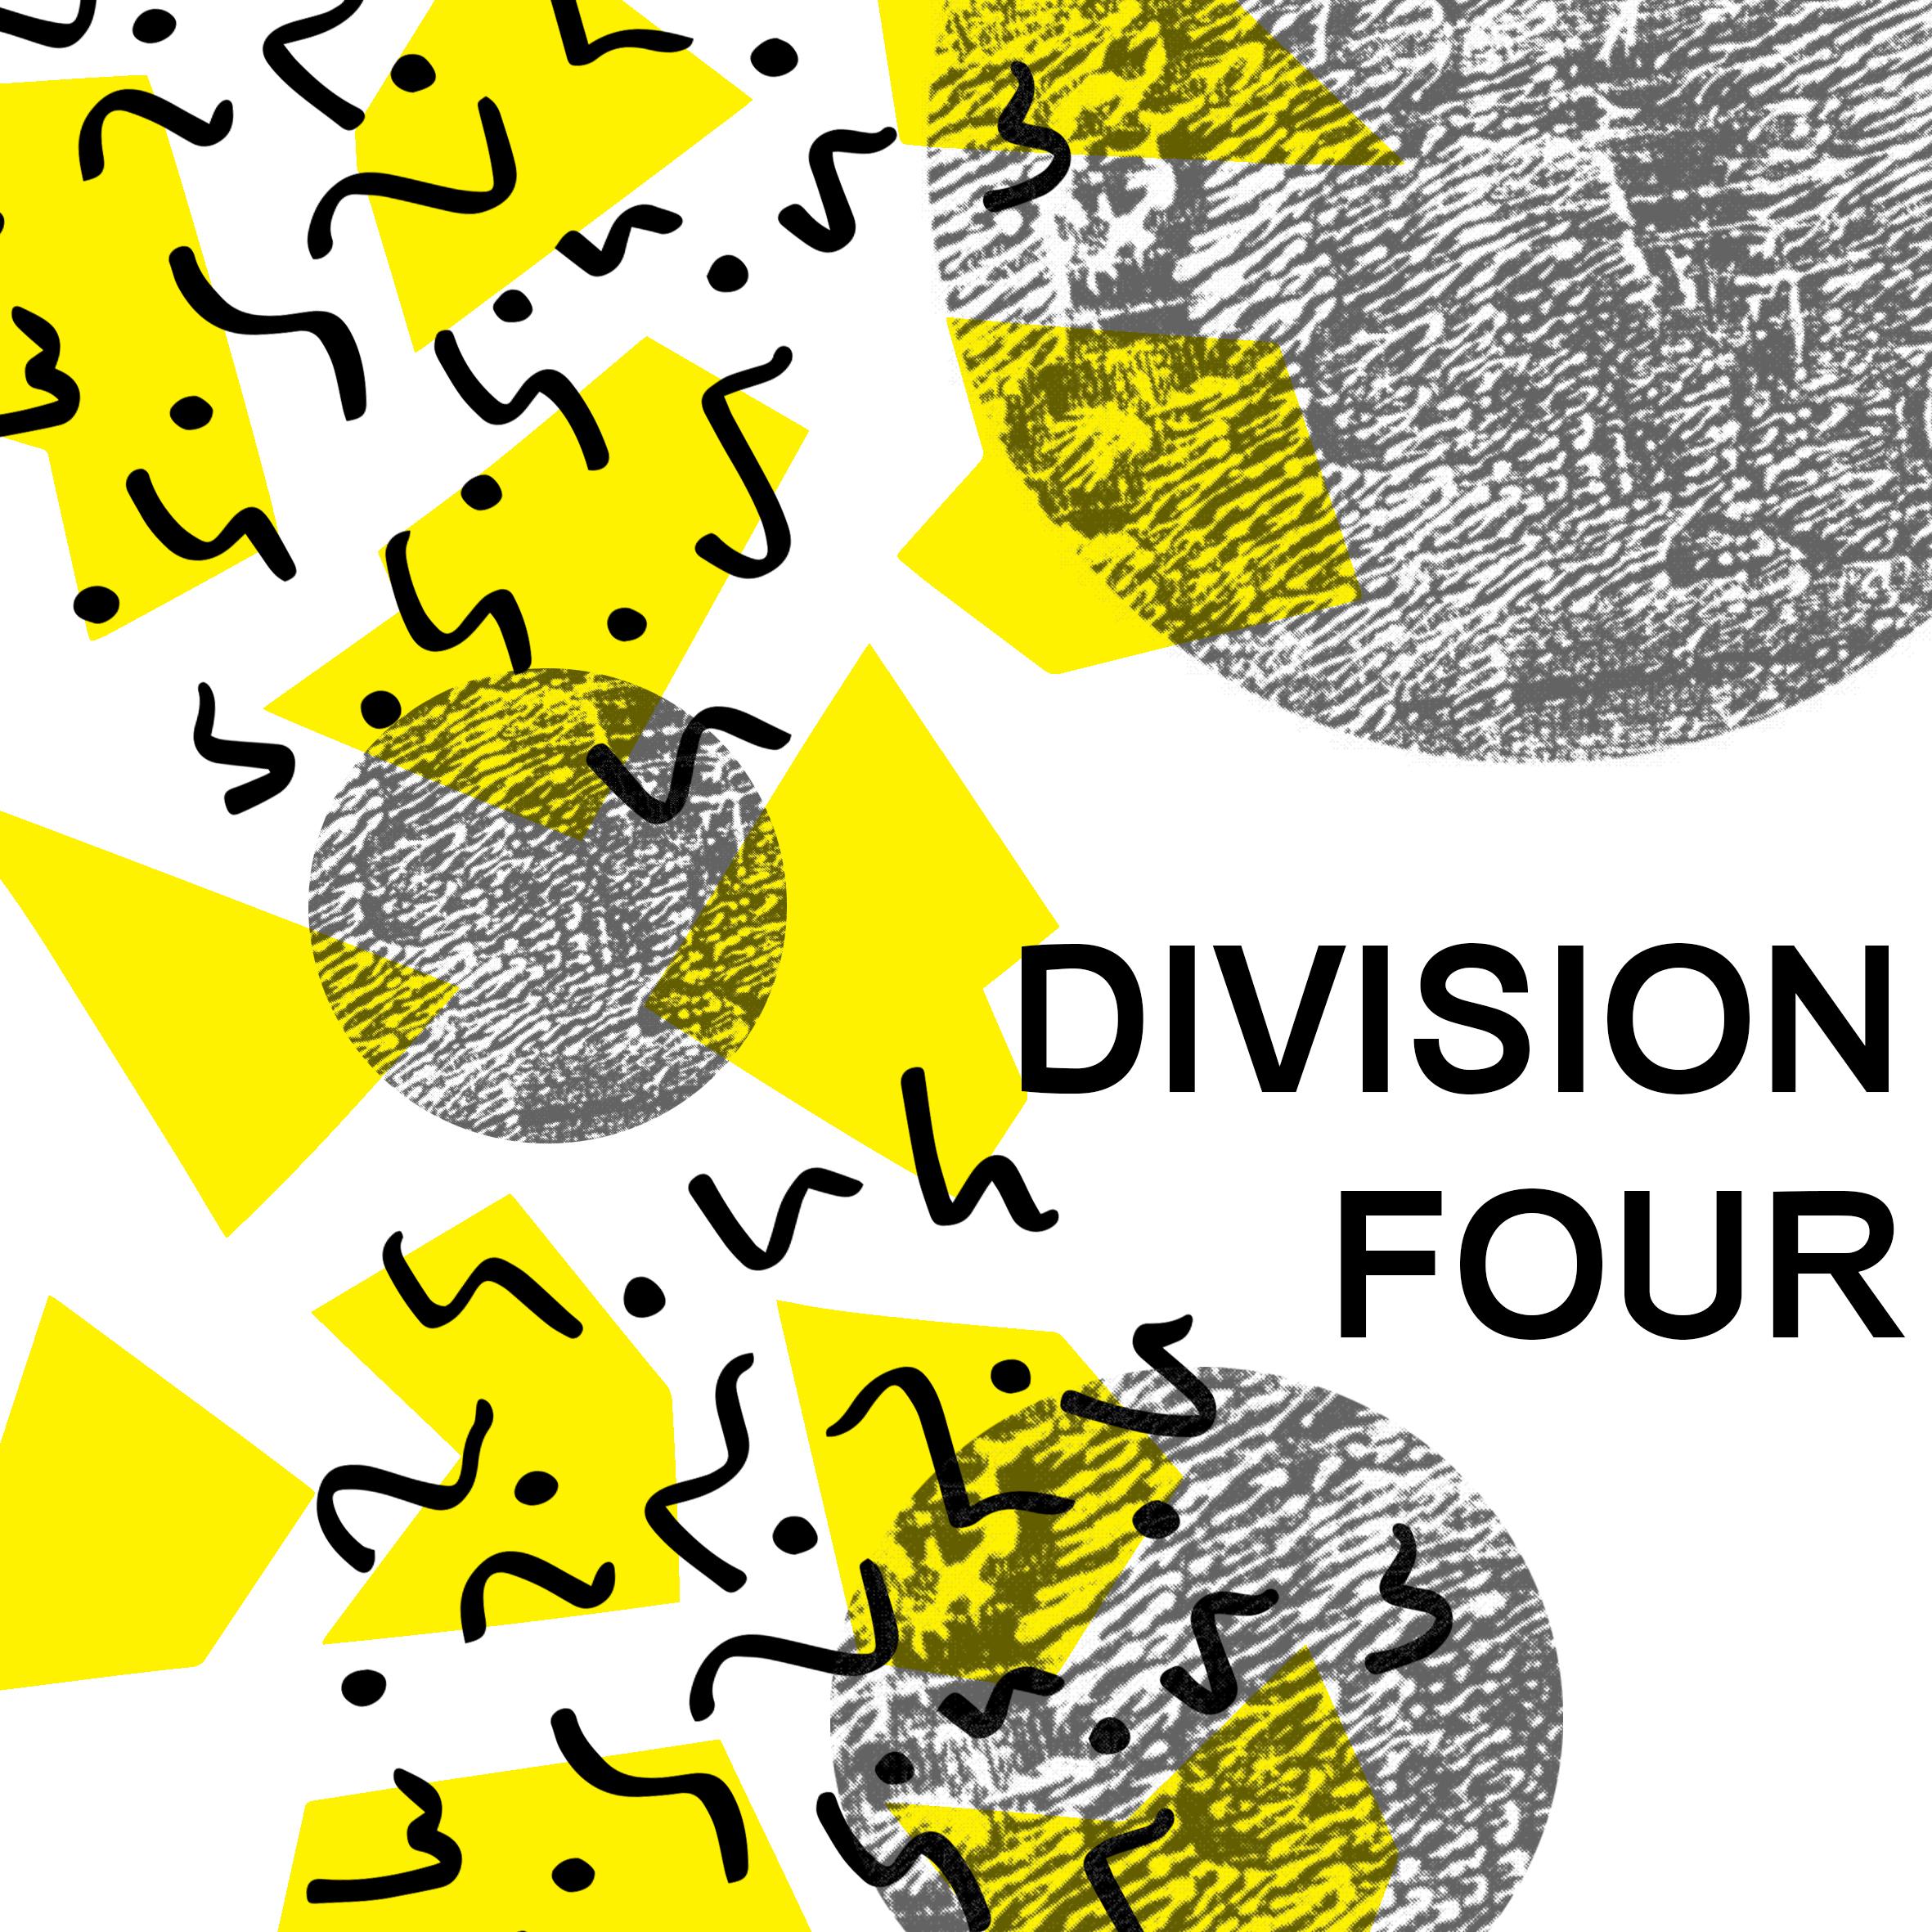 Long Division Compilation Album 2016